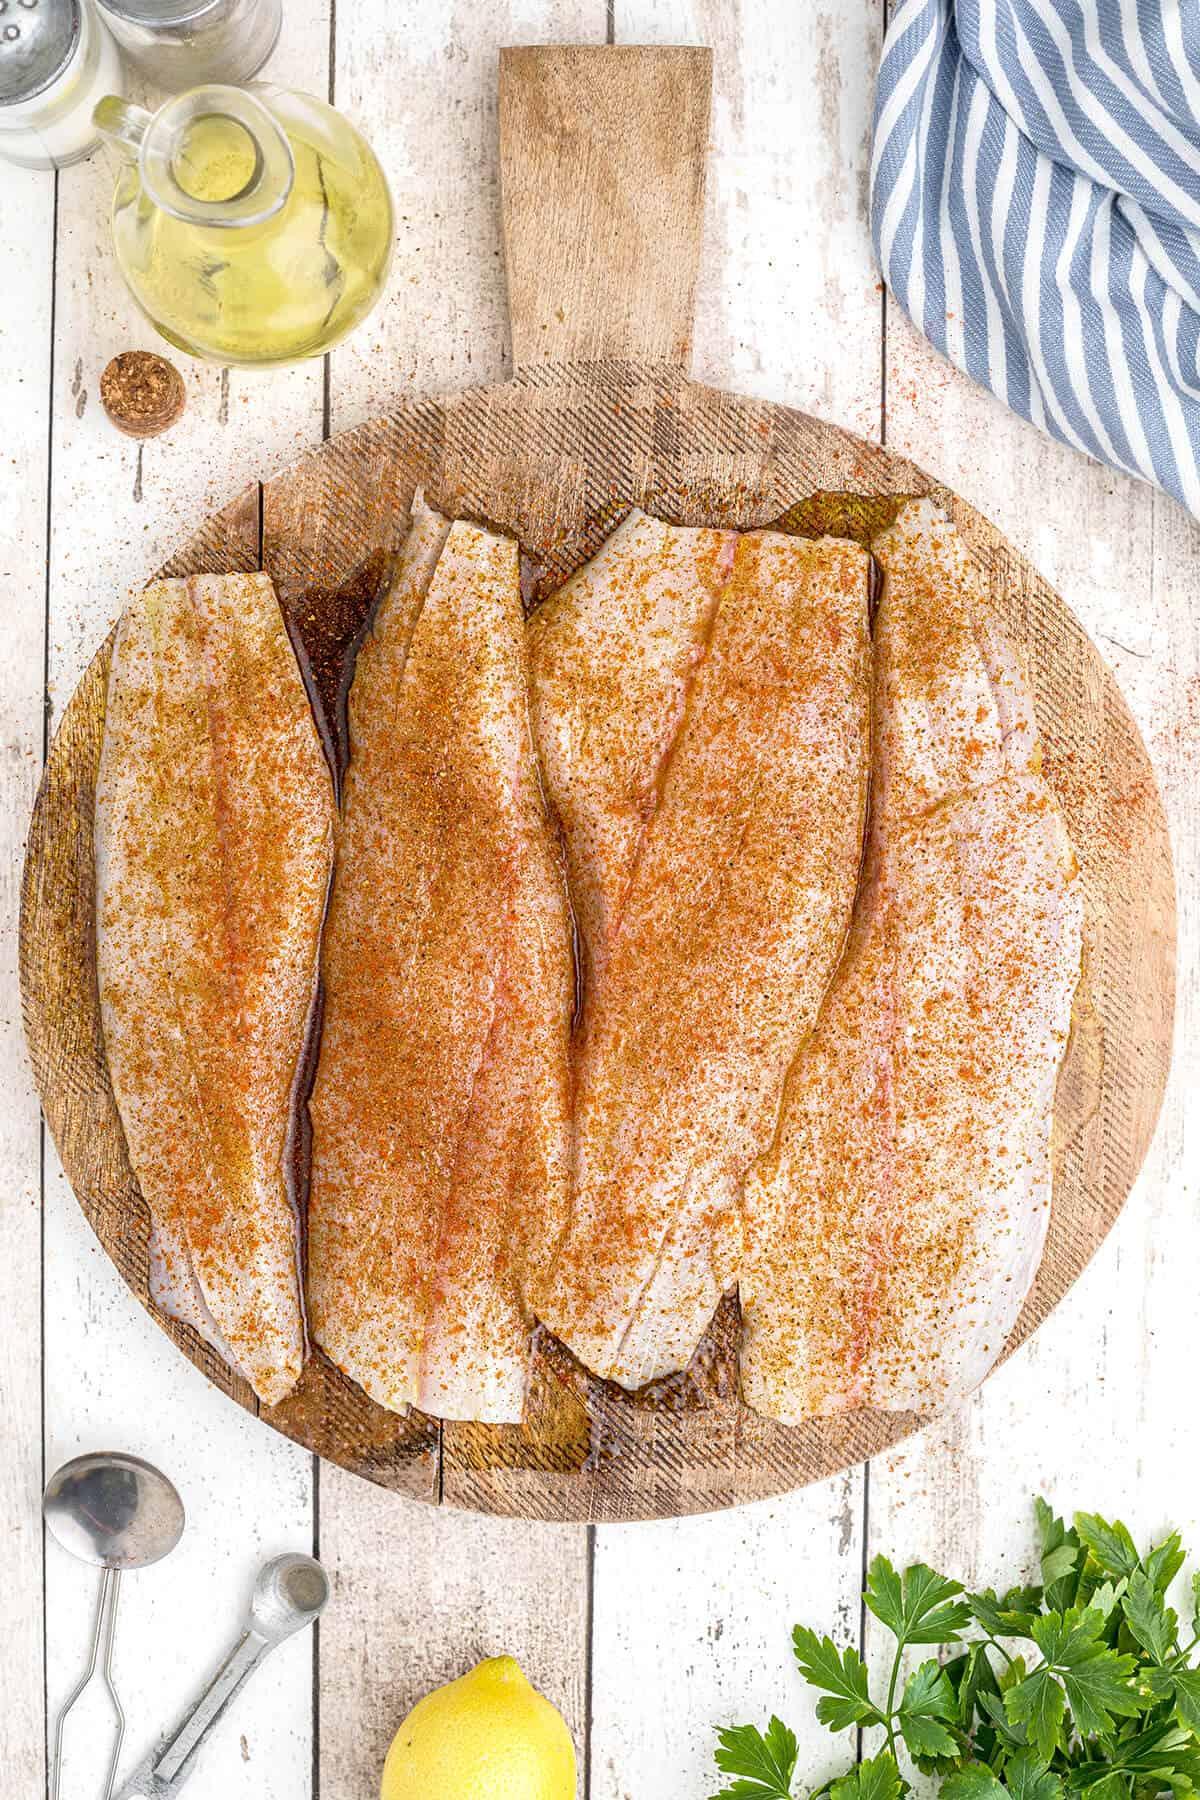 Fish fillets sprinkled with seasonings.